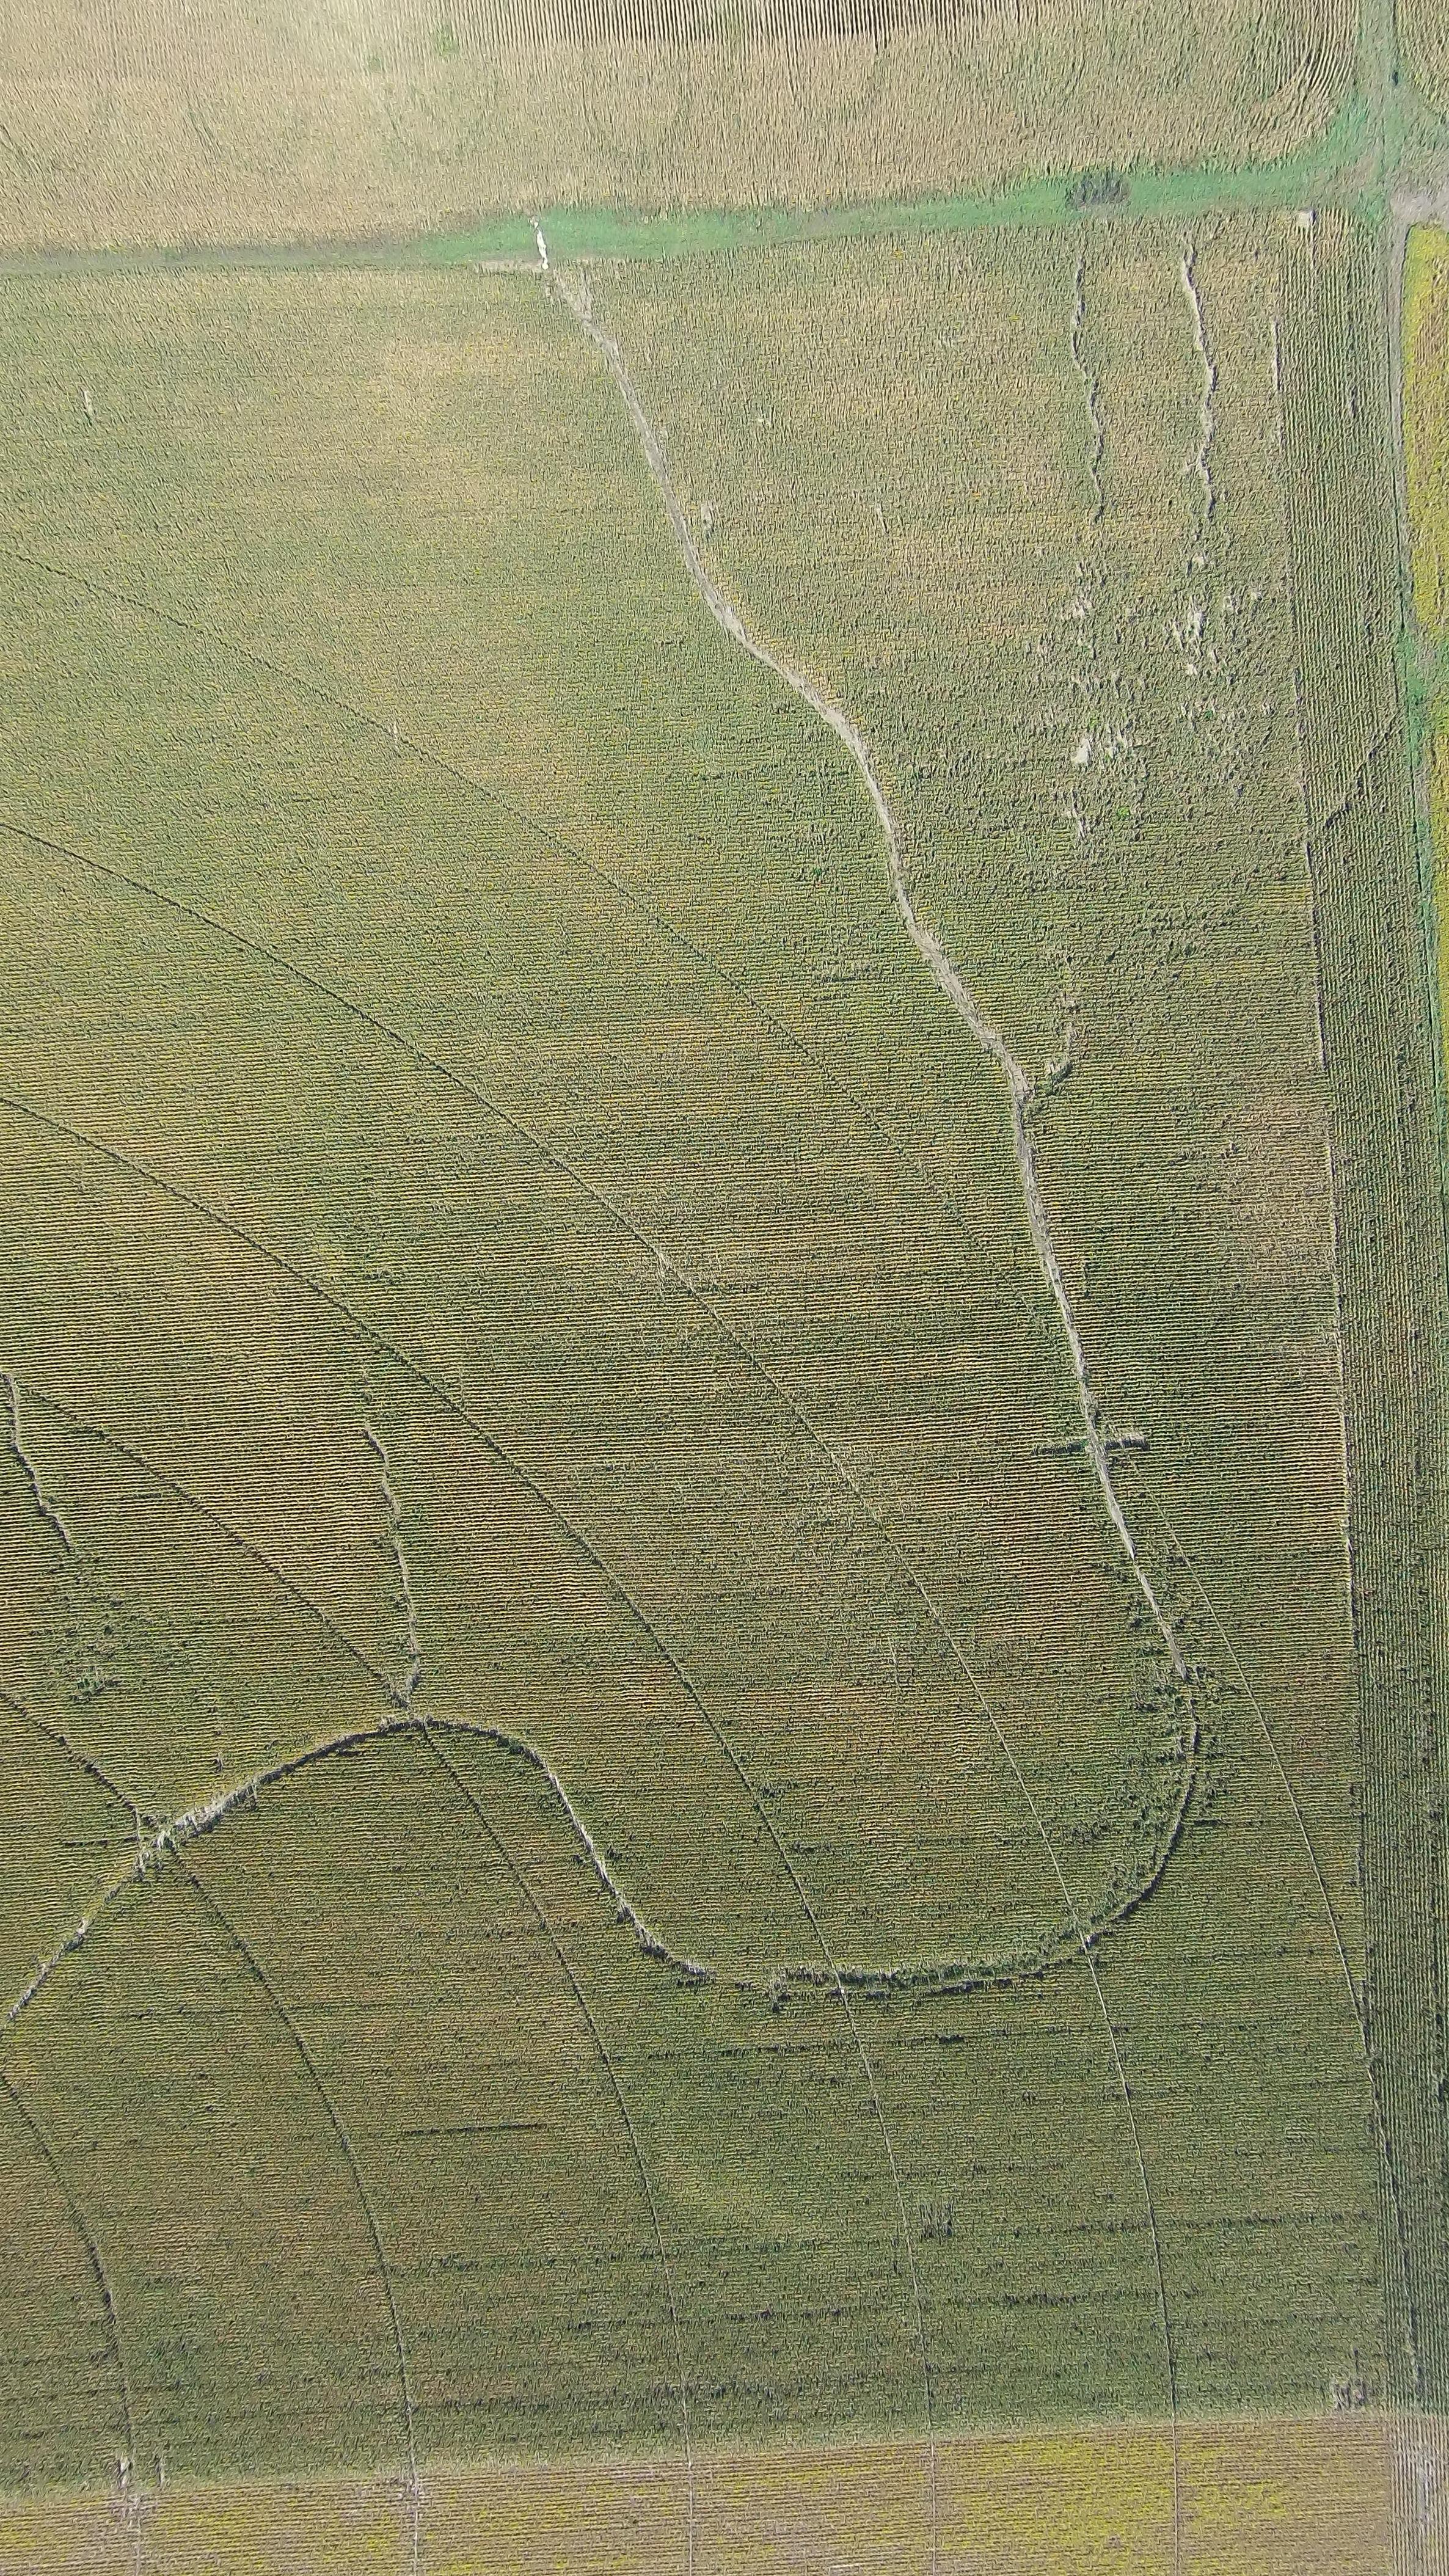 corn-field-3